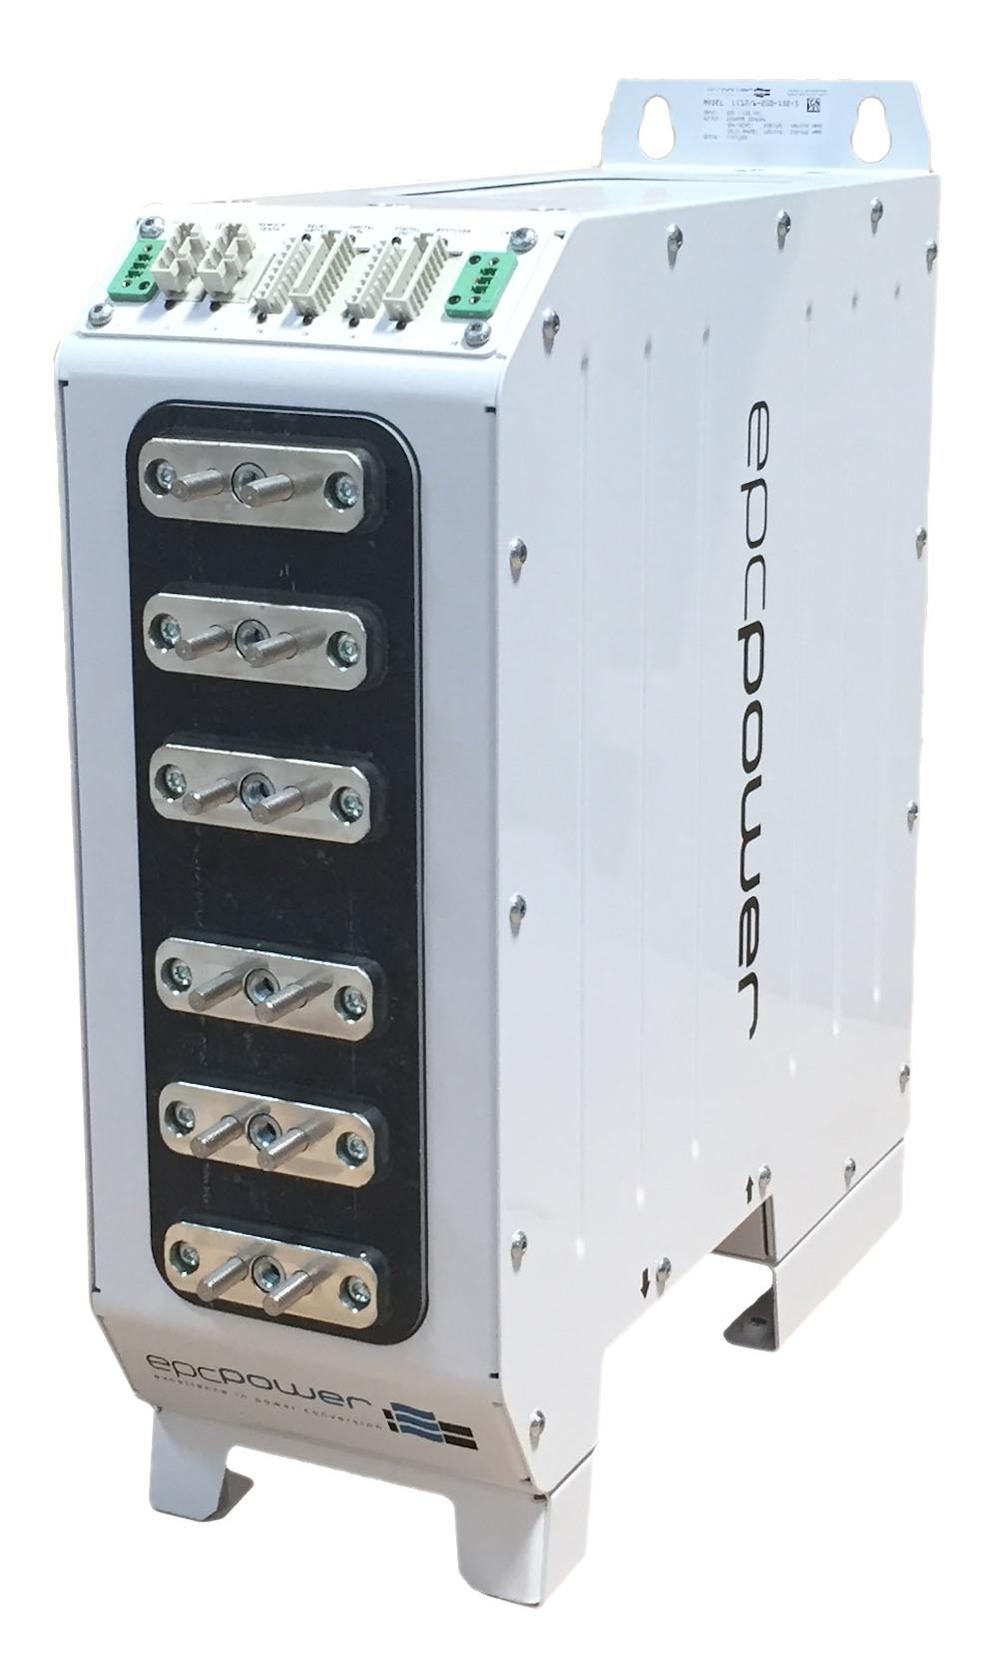 MG-LC12/6 power module